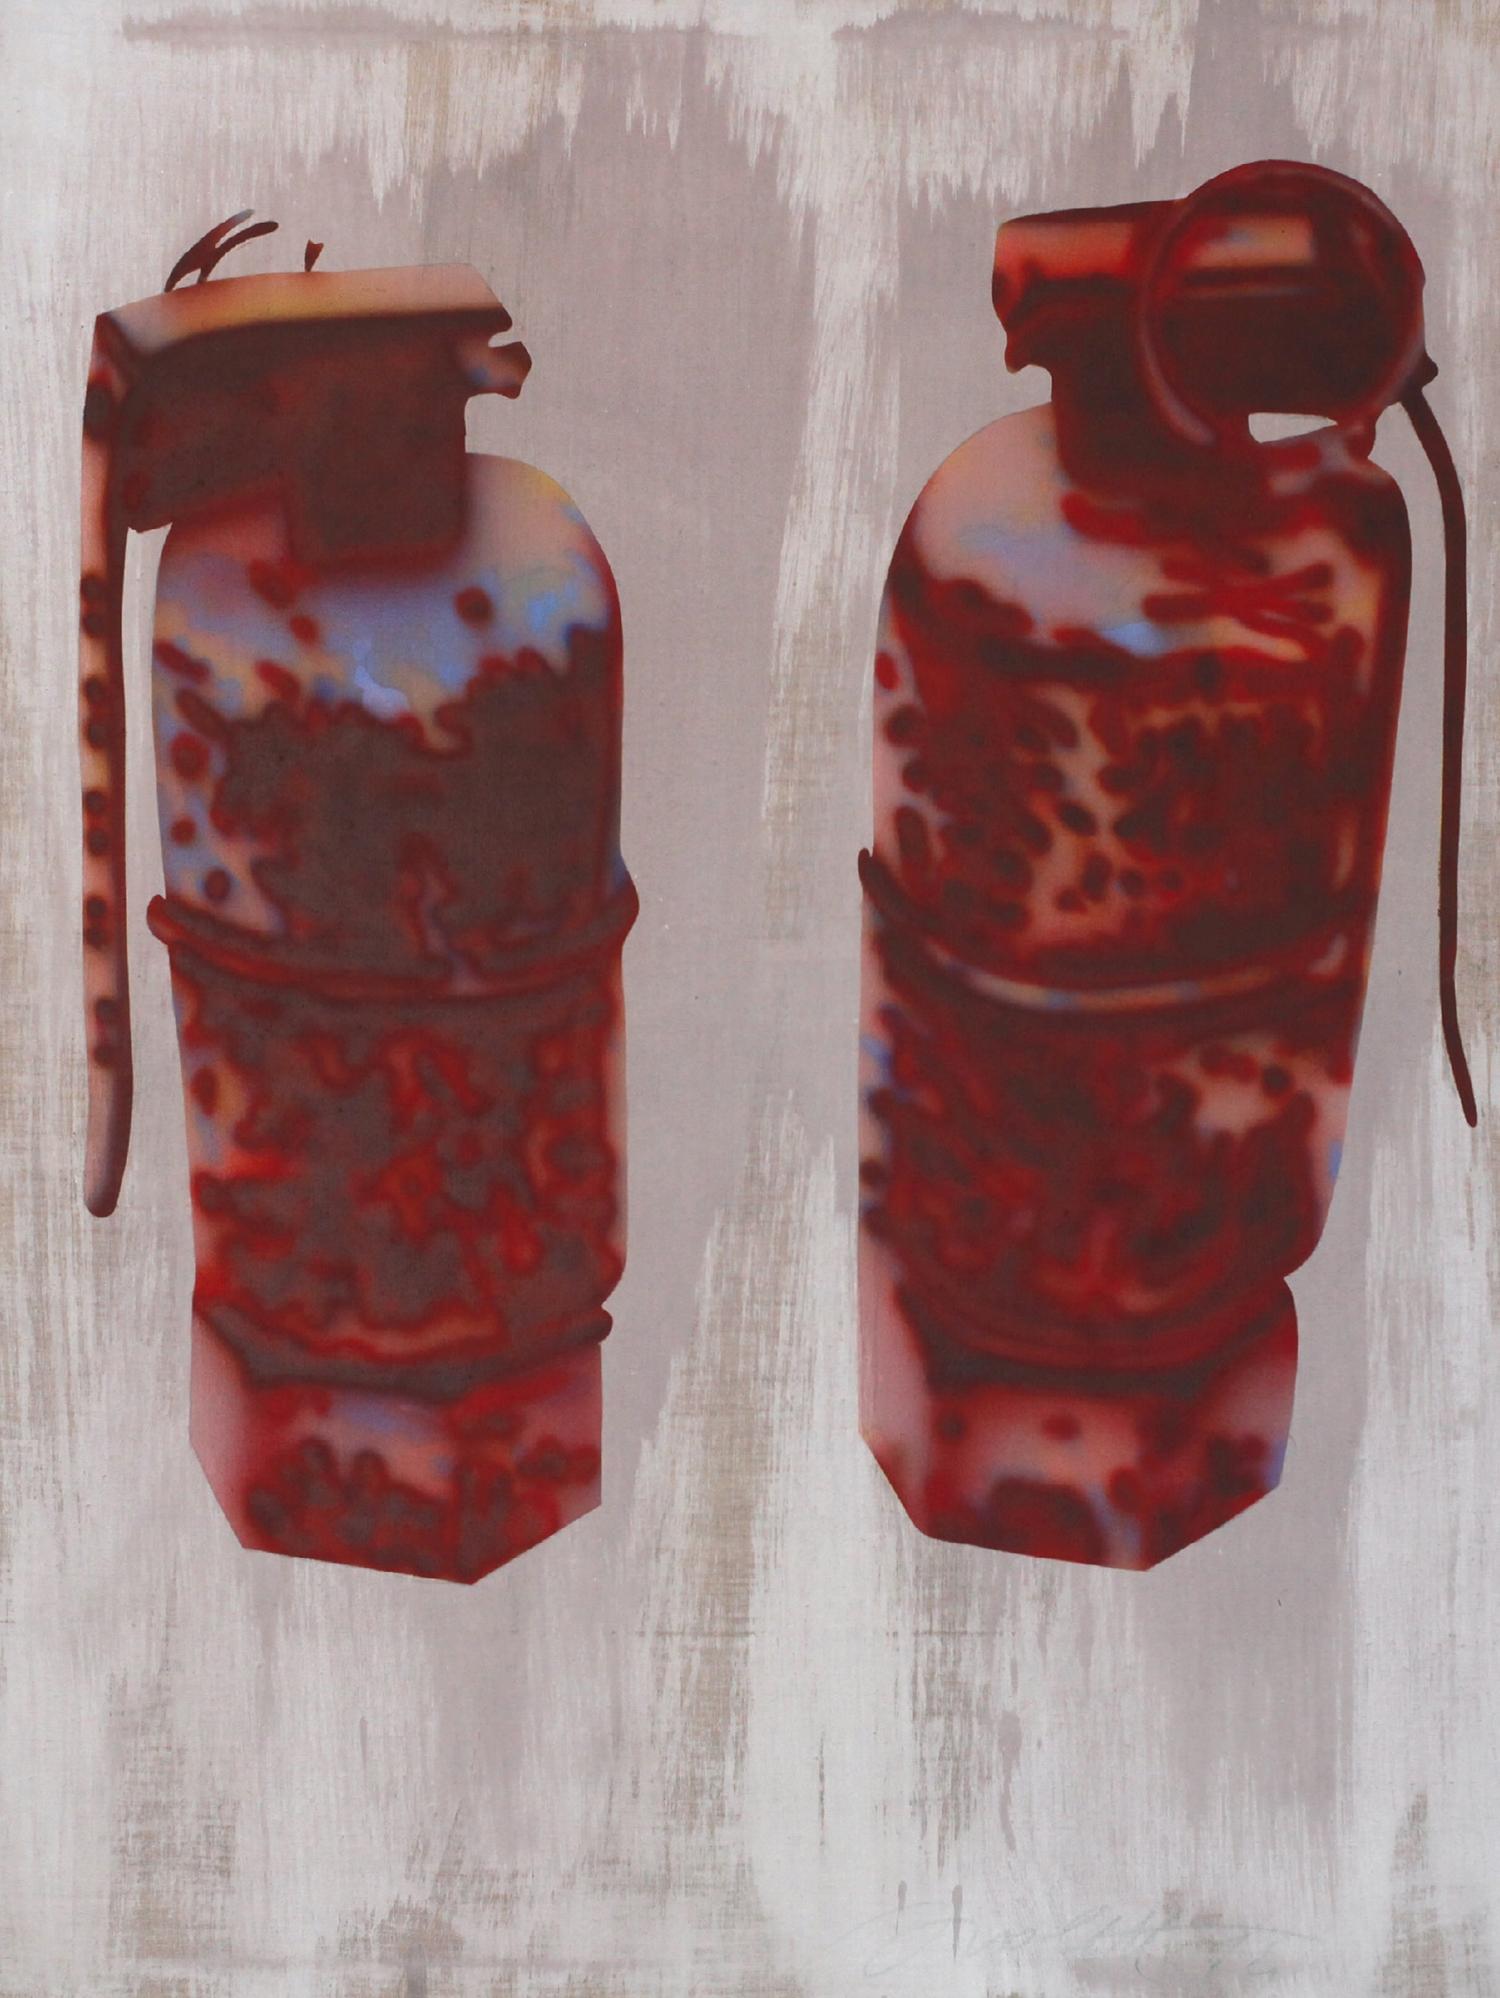 Handgranaten (from the series: Stilleben) 1974  Robert Lettner  Acrylic on canvas (air brush), 129.1 x 99.2 cm Courtesy of Margit Lettner, Vienna  Photo: Robert Lettner / Markus Lettner / Archive Robert Lettner, 2018